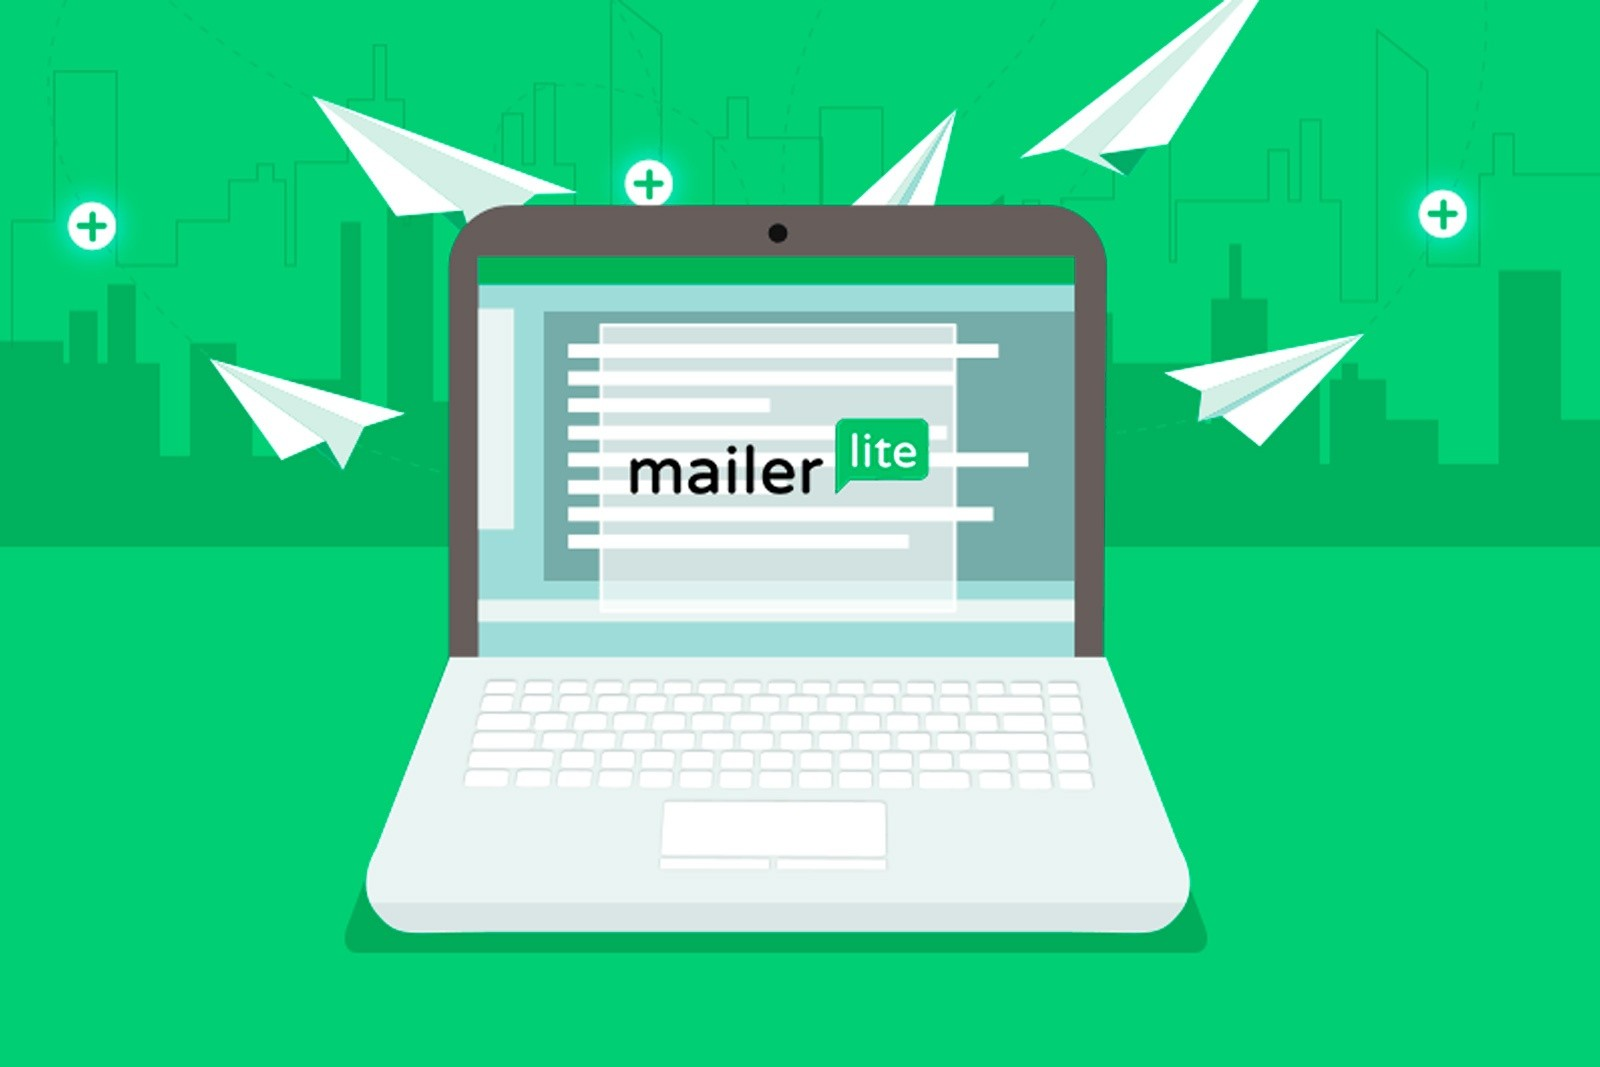 MailirLite